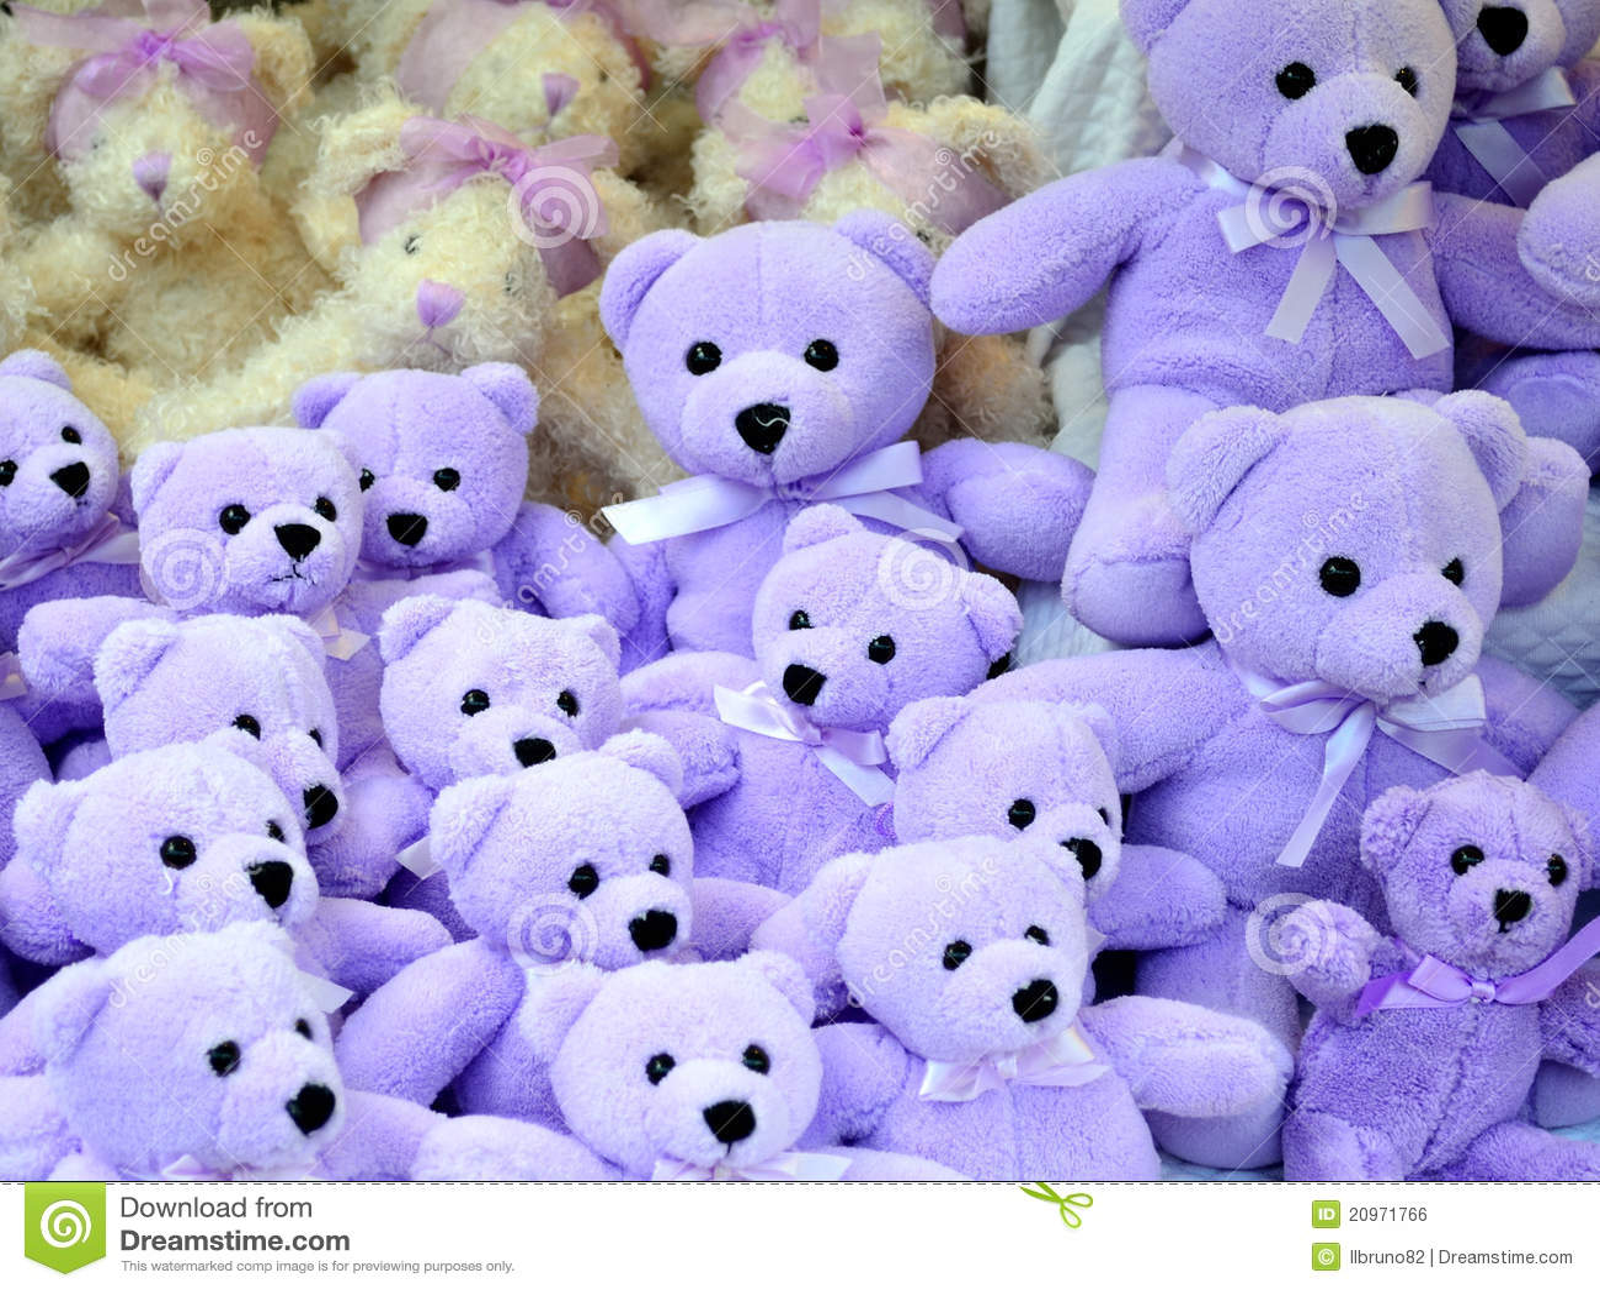 Colorful Teddybears Royalty Free Stock Image - Image: 20971766 - photo#15